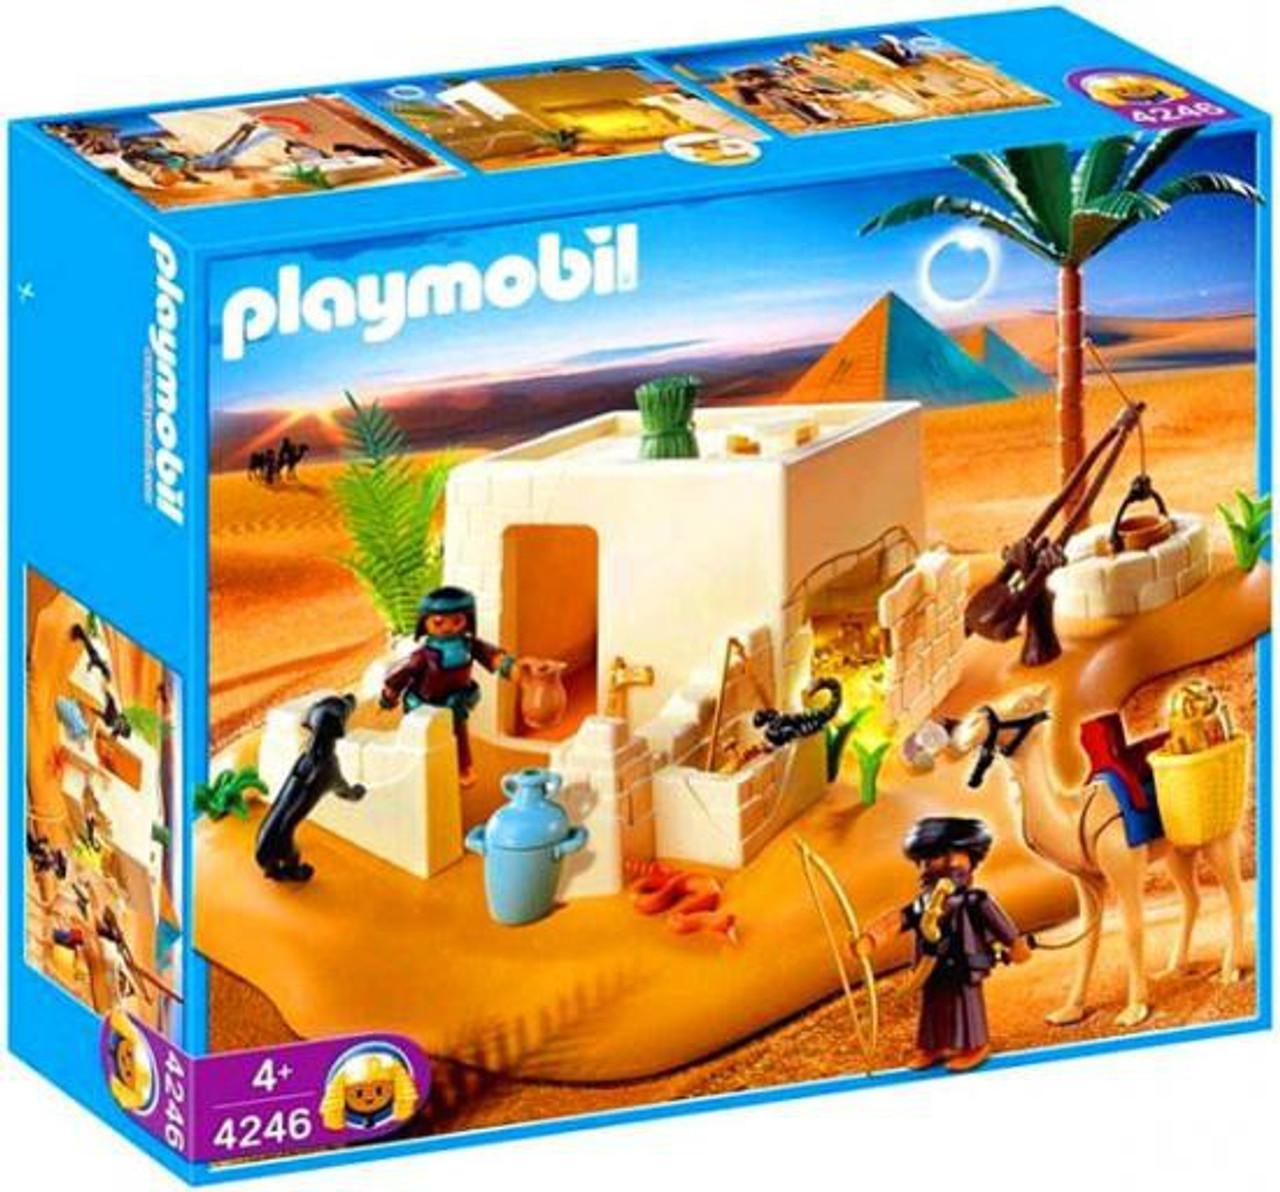 Playmobil 4246 tomb with treasure